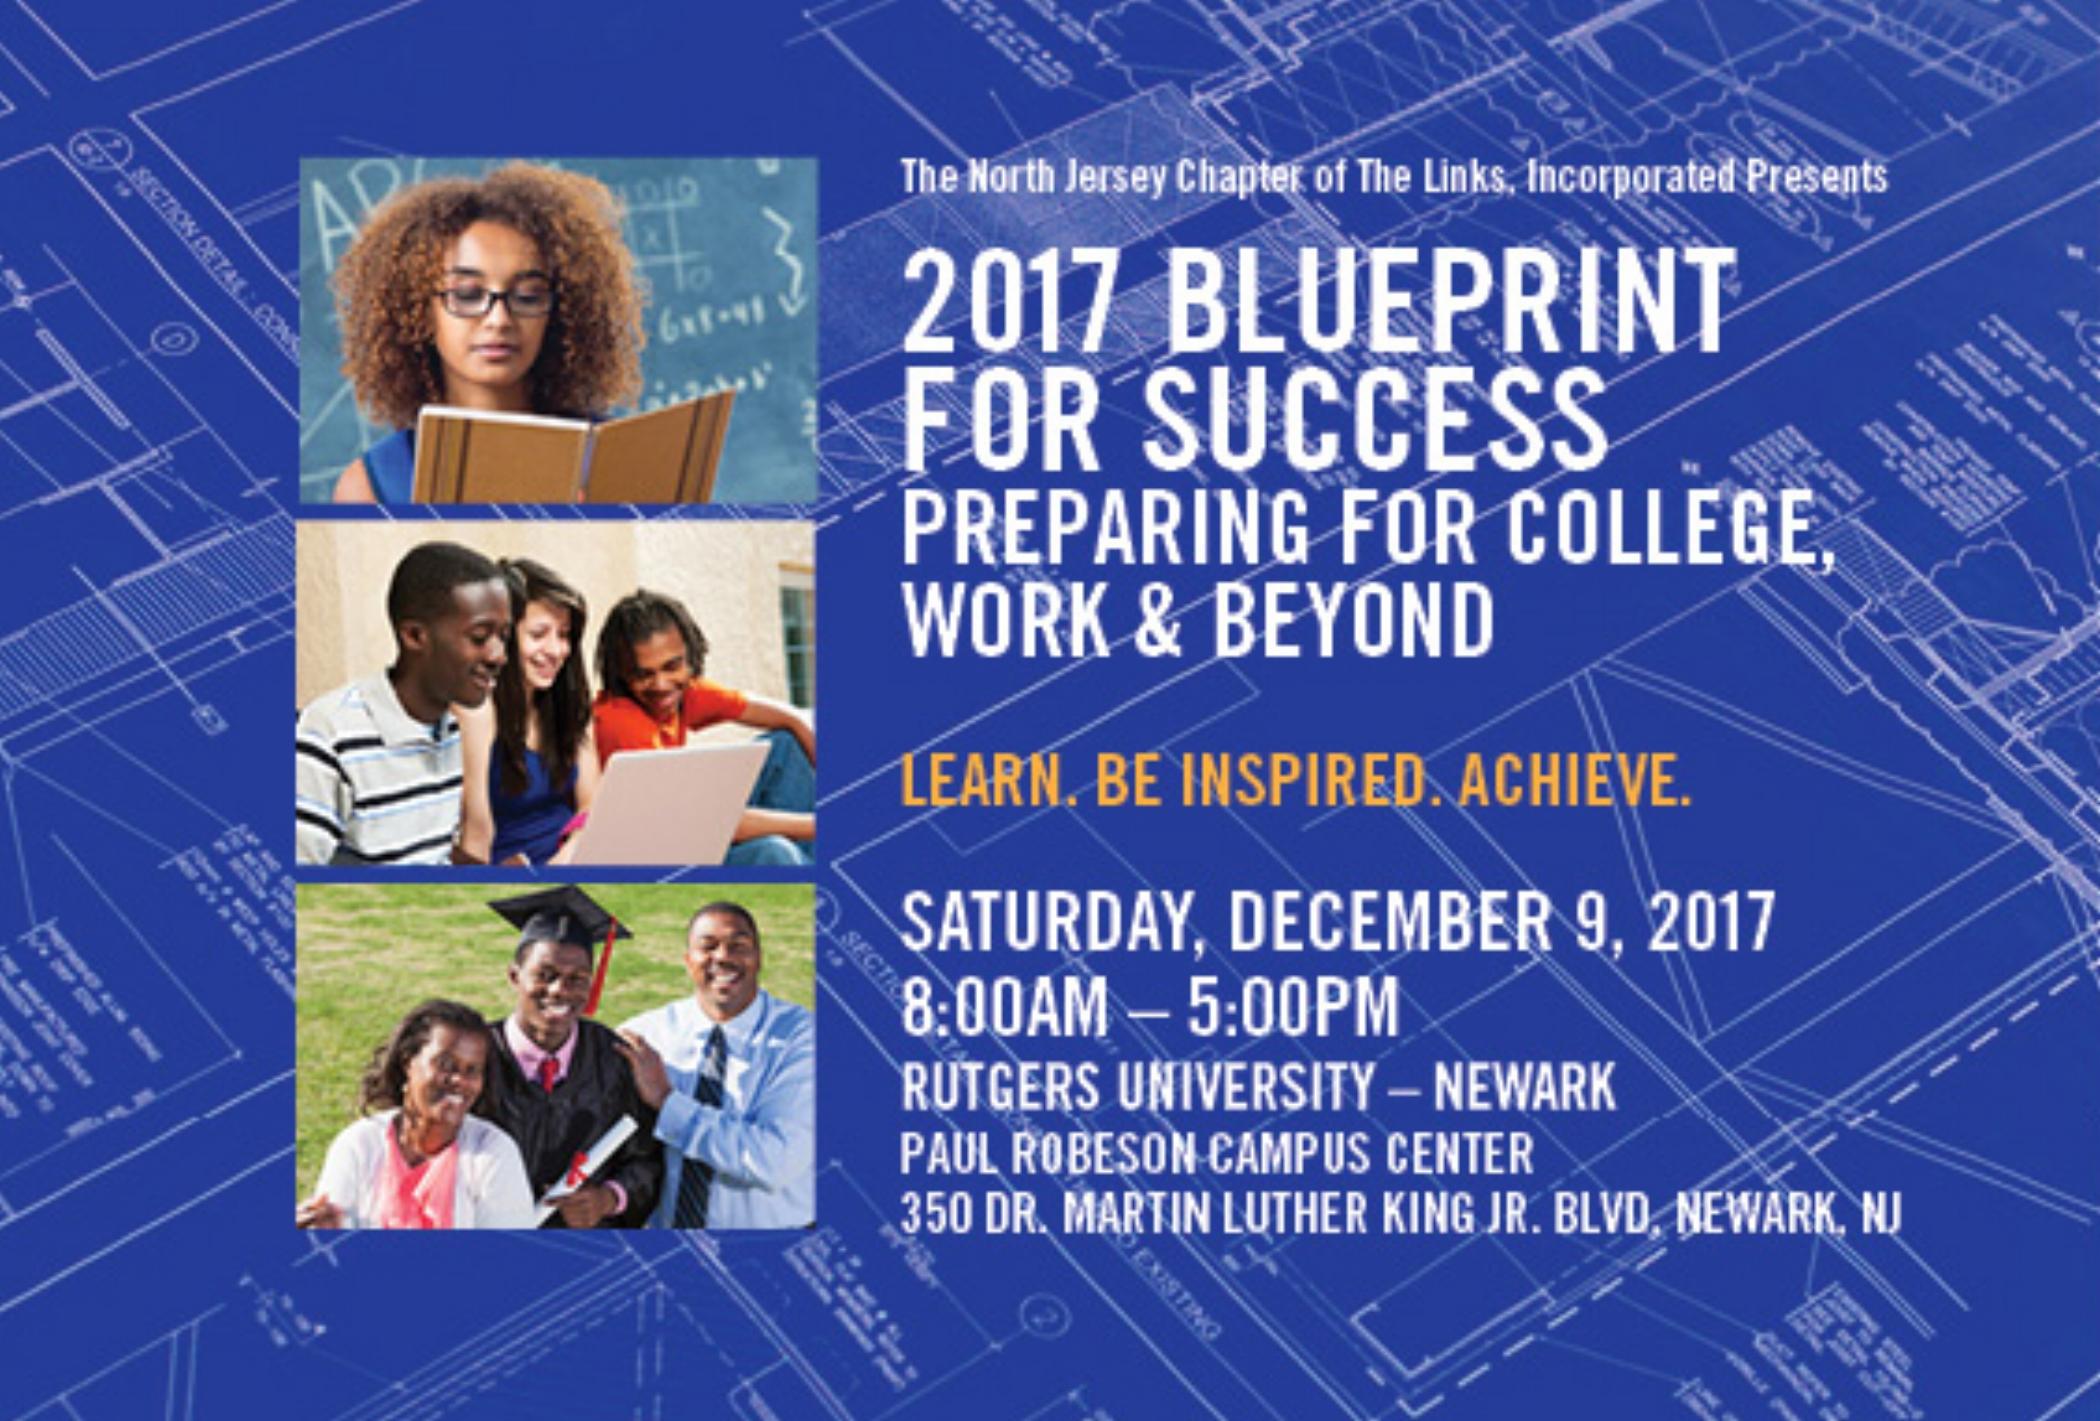 110117-UWEWH-Blueprint-for-Success-2017.jpg